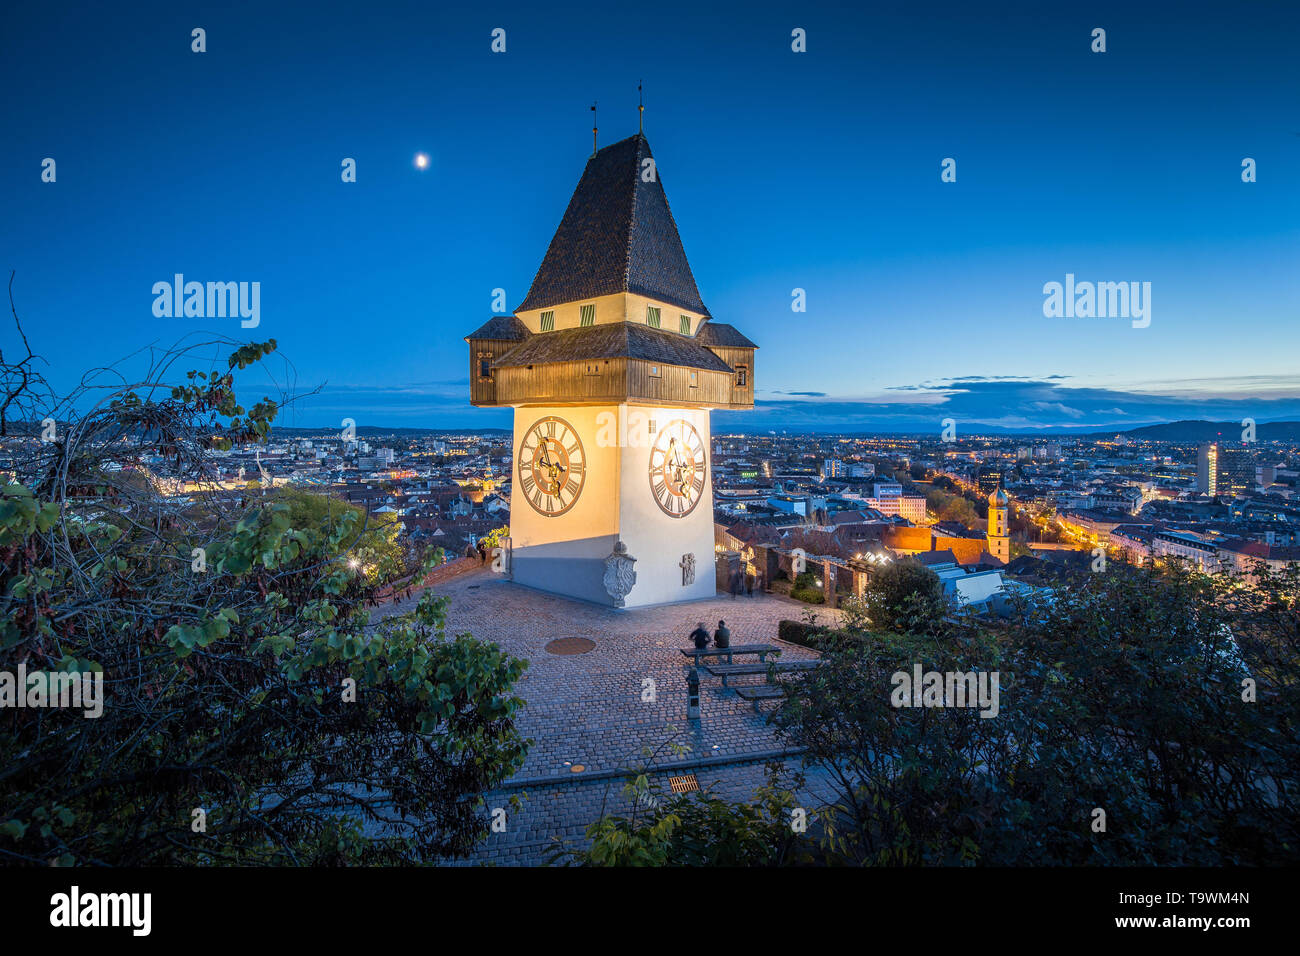 Beautiful twilight view of famous Grazer Uhrturm (clock tower) illuminated during blue hour at dusk, Graz, Styria region, Austria - Stock Image